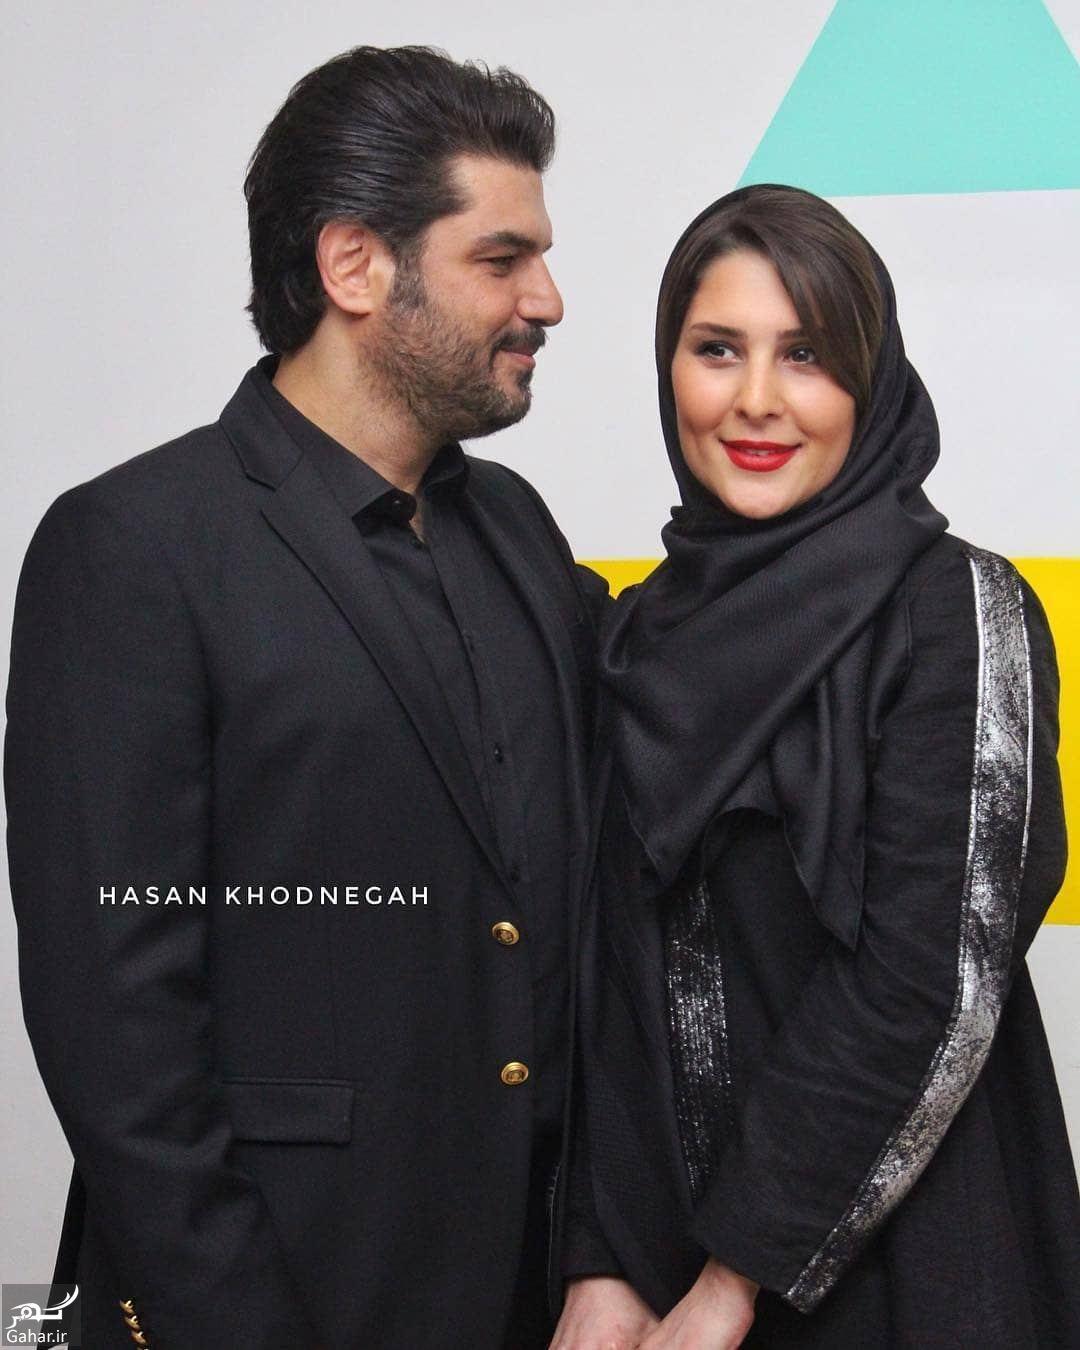 958978 Gahar ir عکس های جدید سام درخشانی و همسرش در اکران خصوصی  دشمن زن